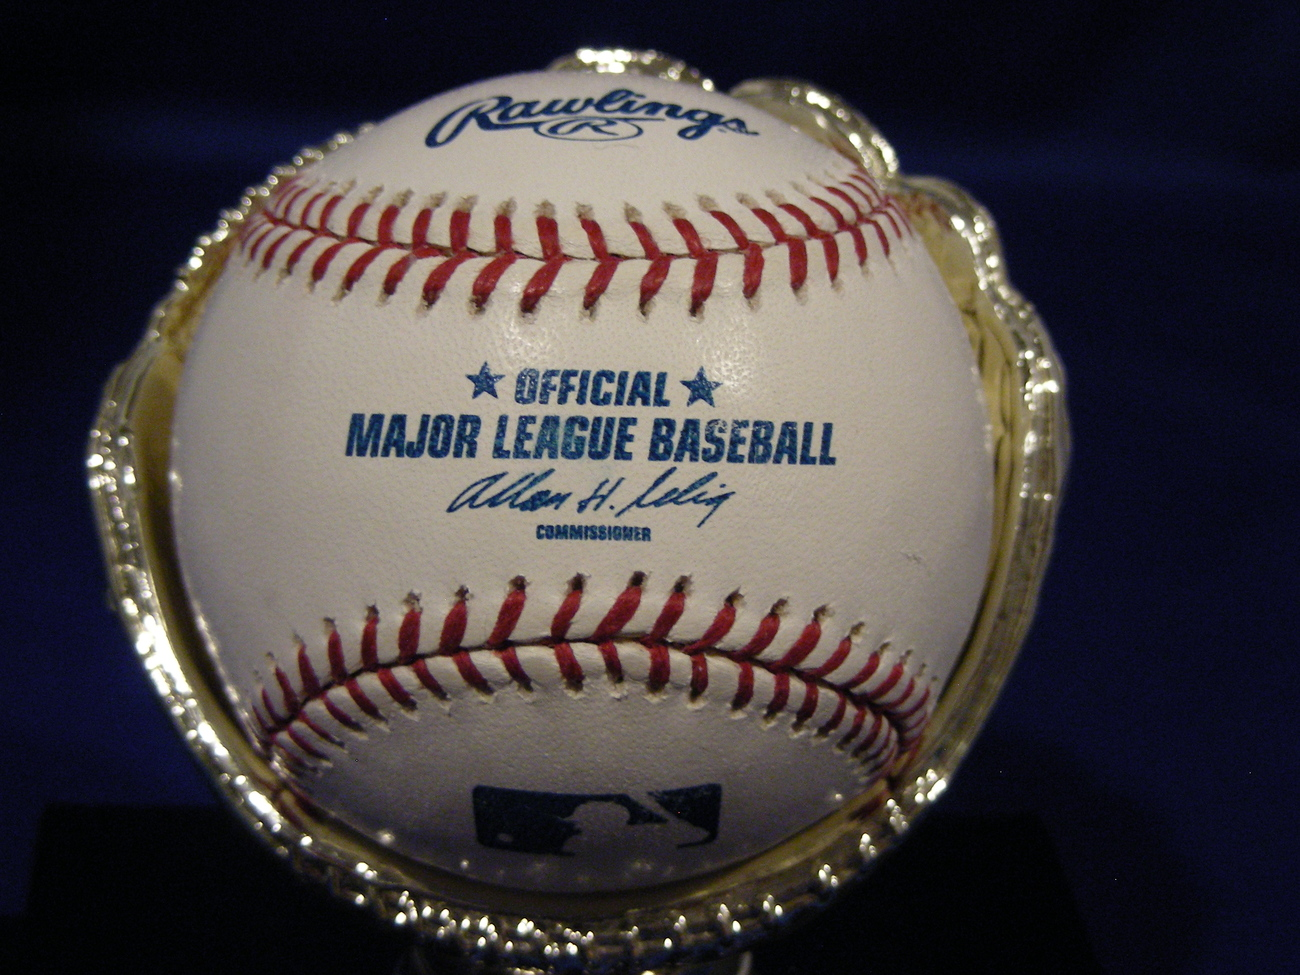 JUAN MARICHAL HOF 1983 NO-HITTER JUNE 15TH 1963 SIGNED AUTO BASEBALL MLB AUTH